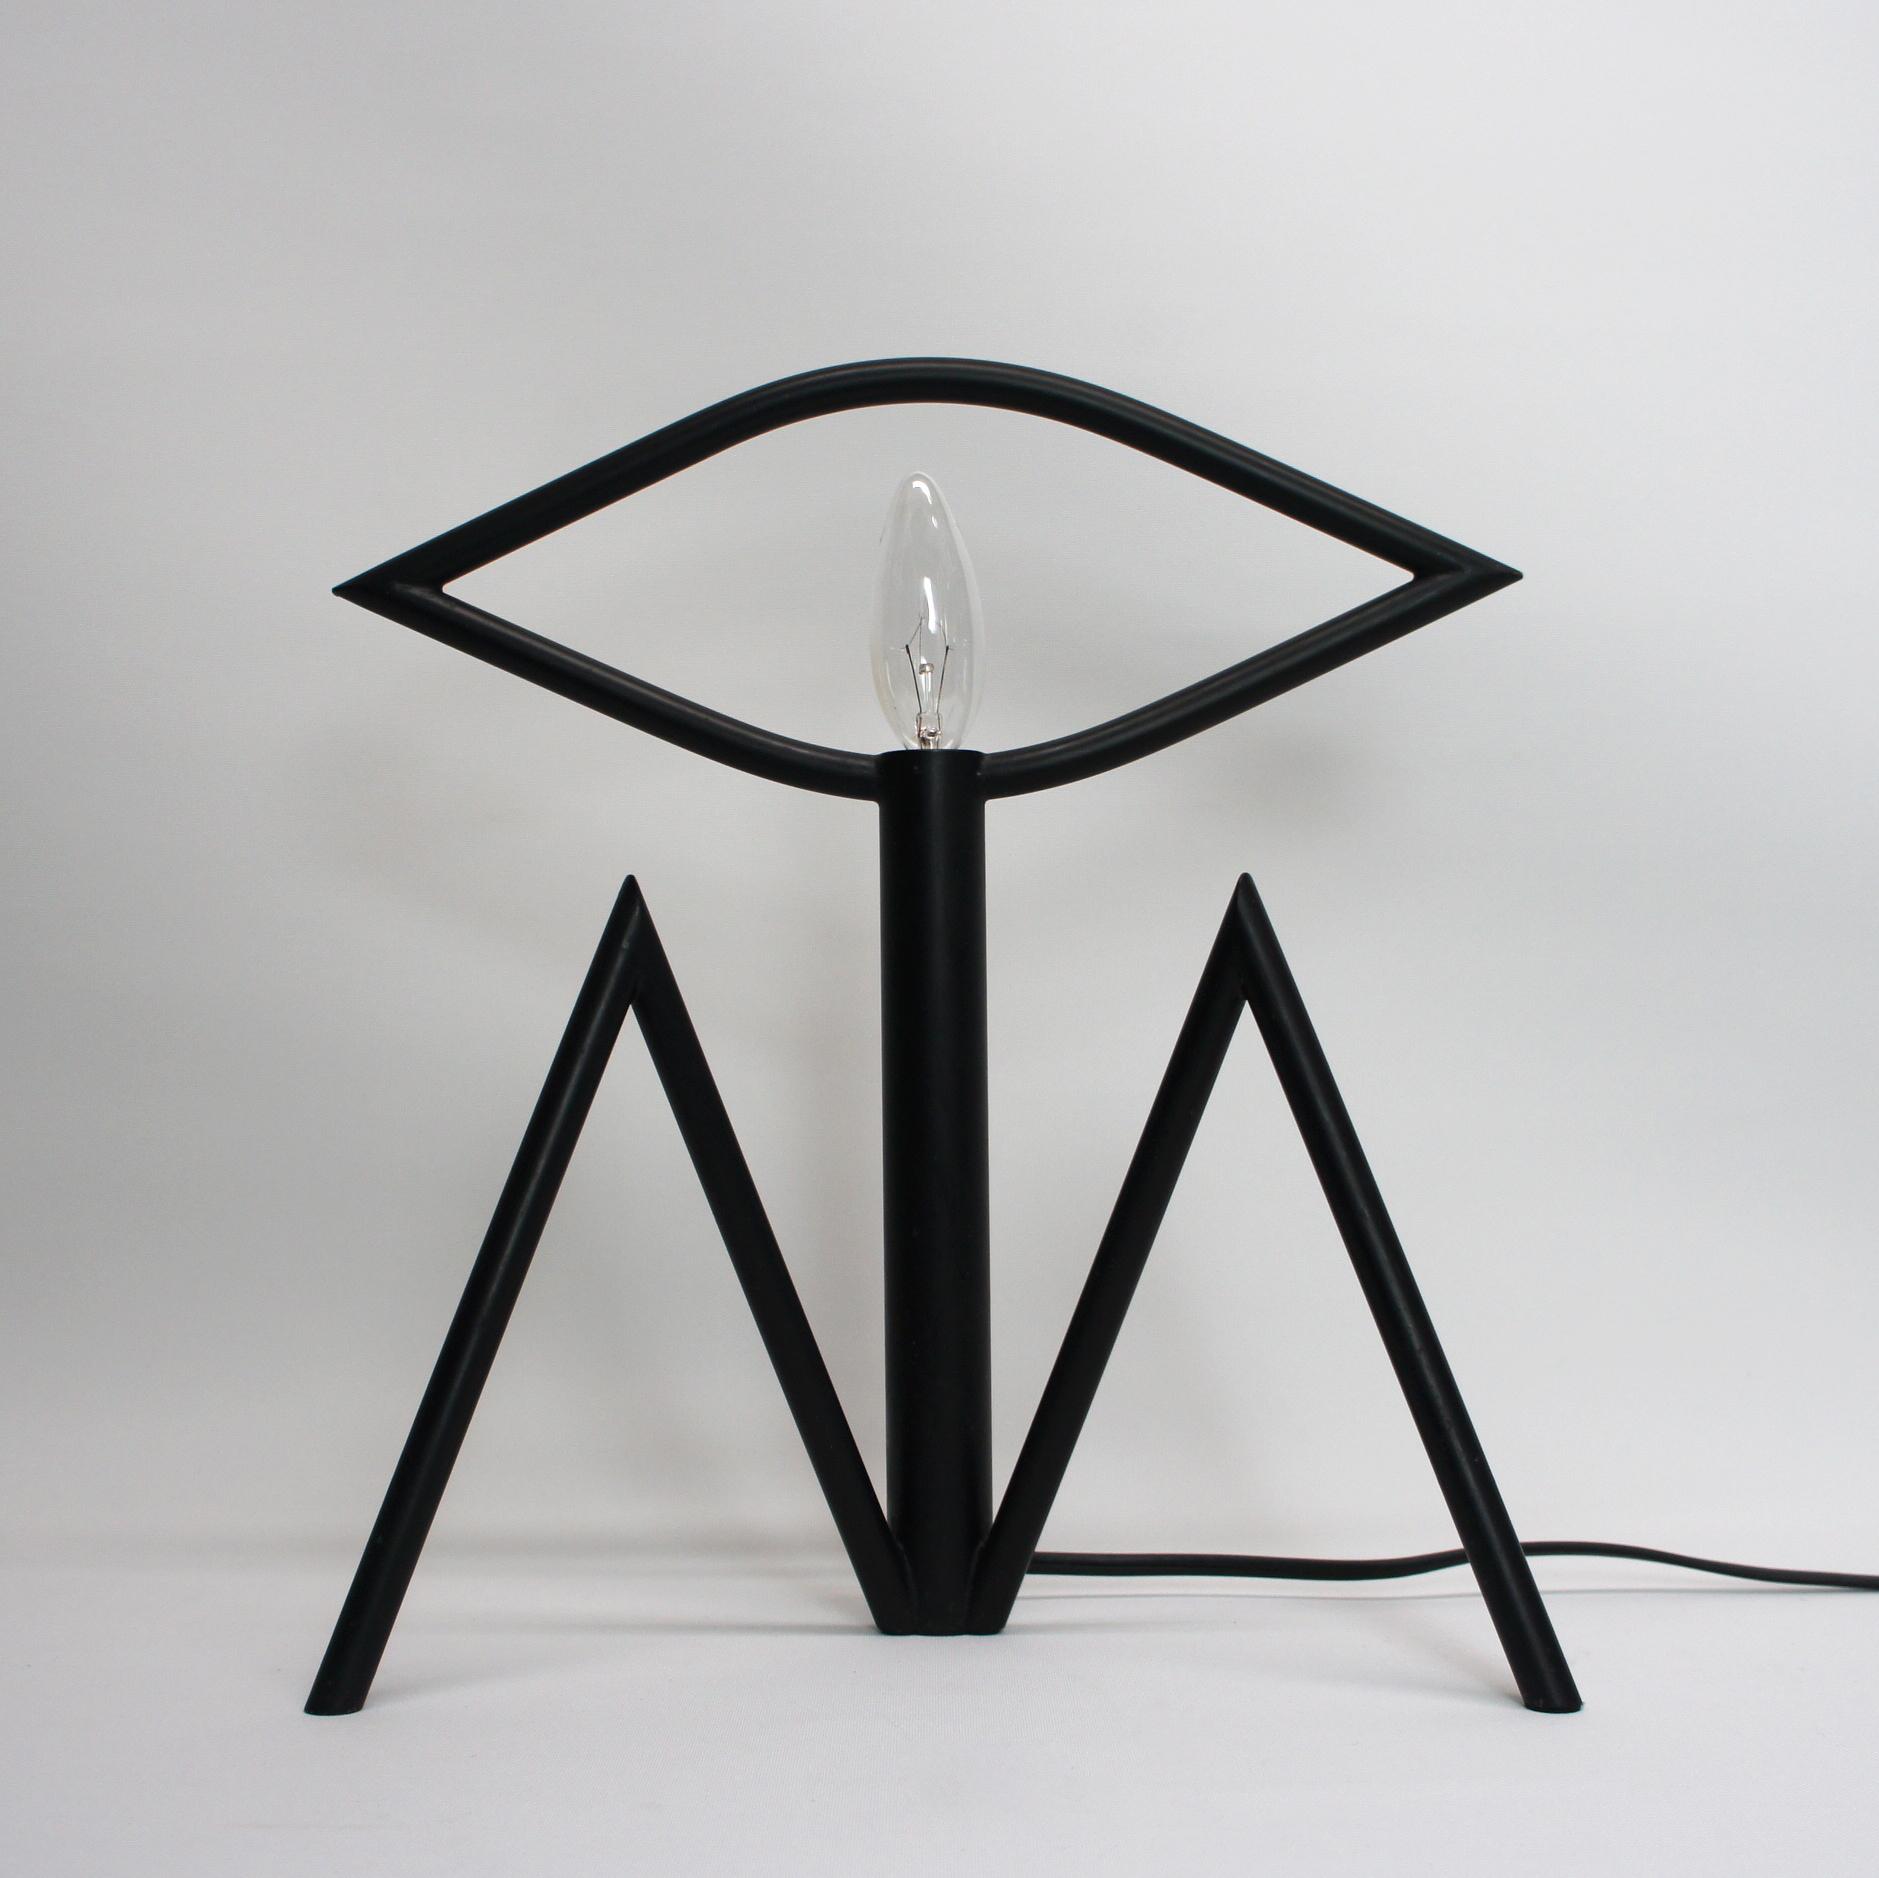 Stephen Bam Design